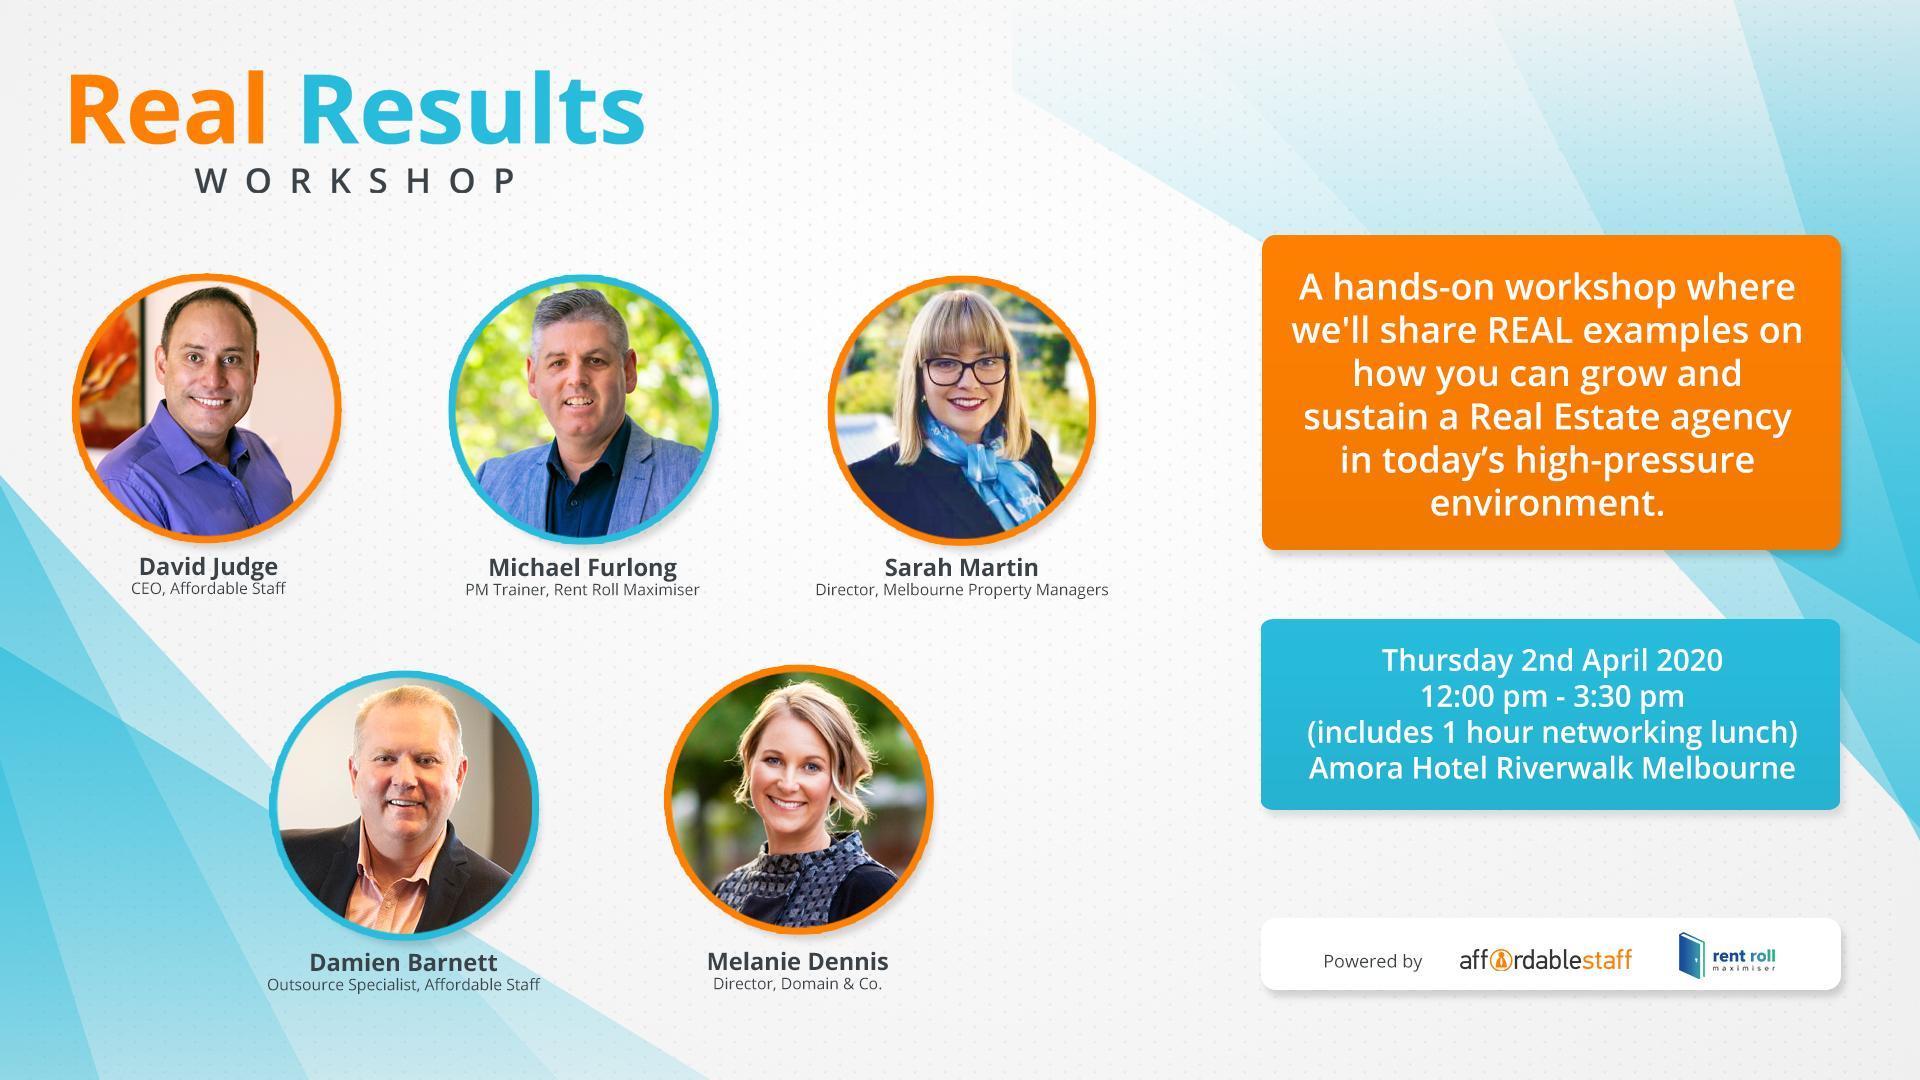 Real Results Workshop